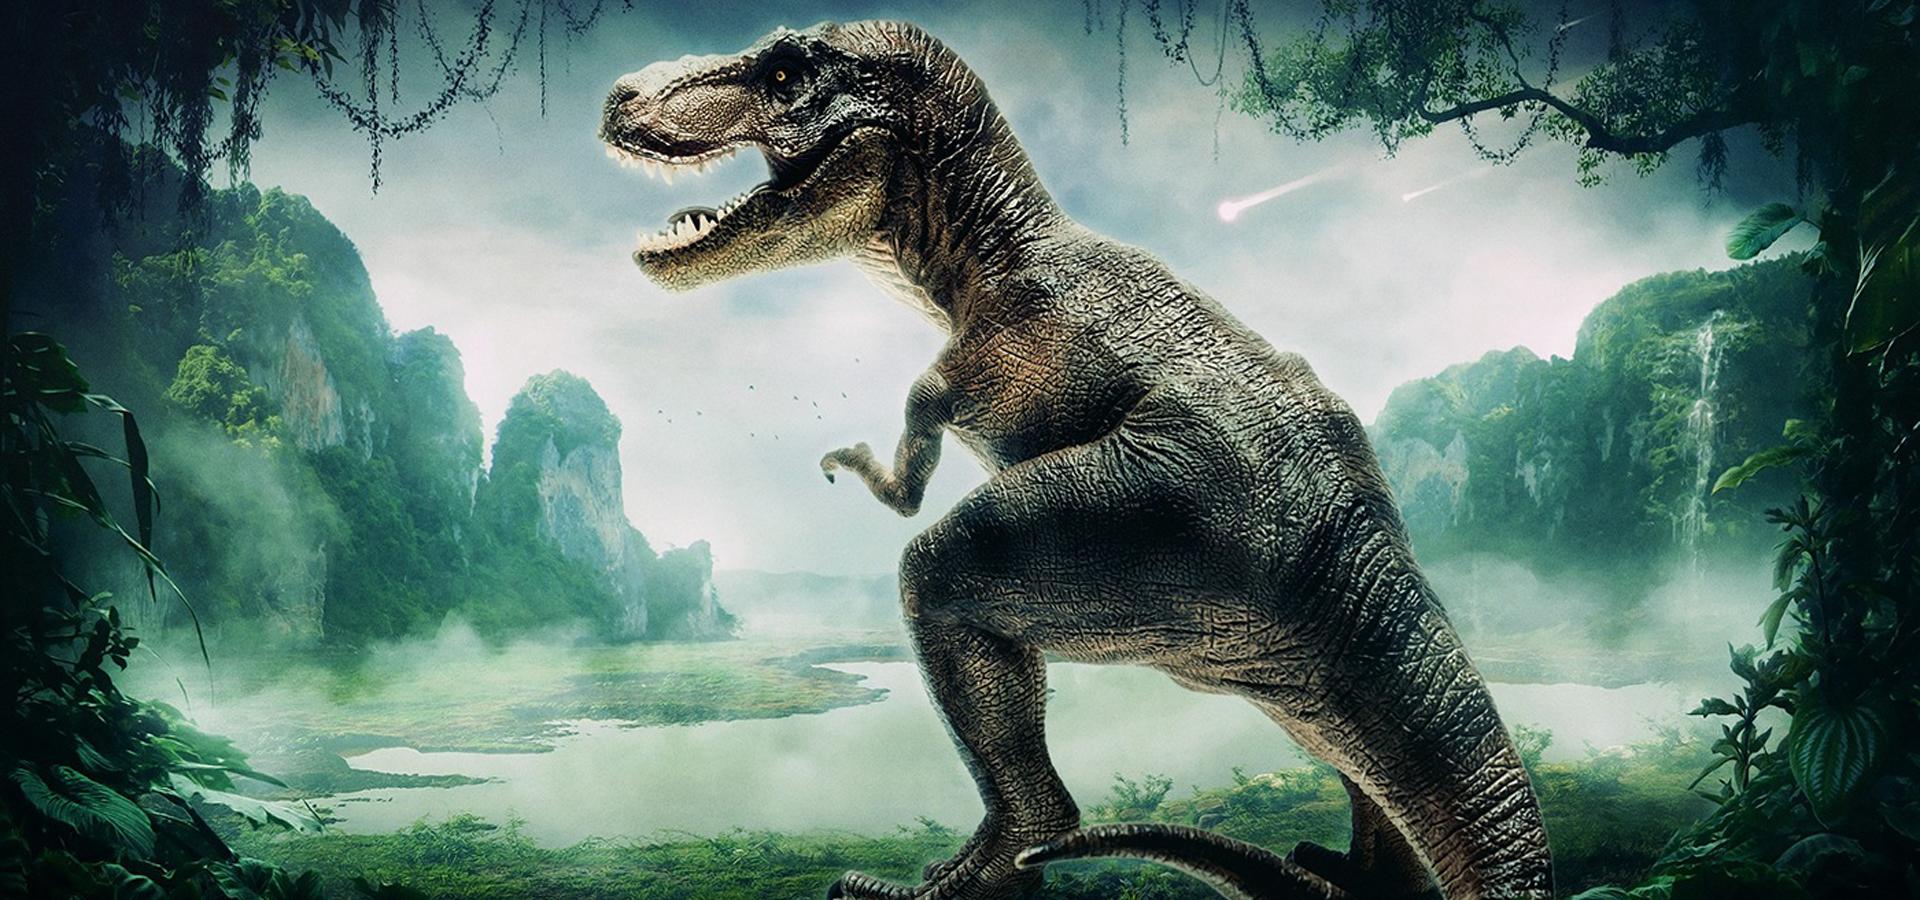 l u00e9zard dinosaure de la faune wild contexte zoo de l u0026 39 eau